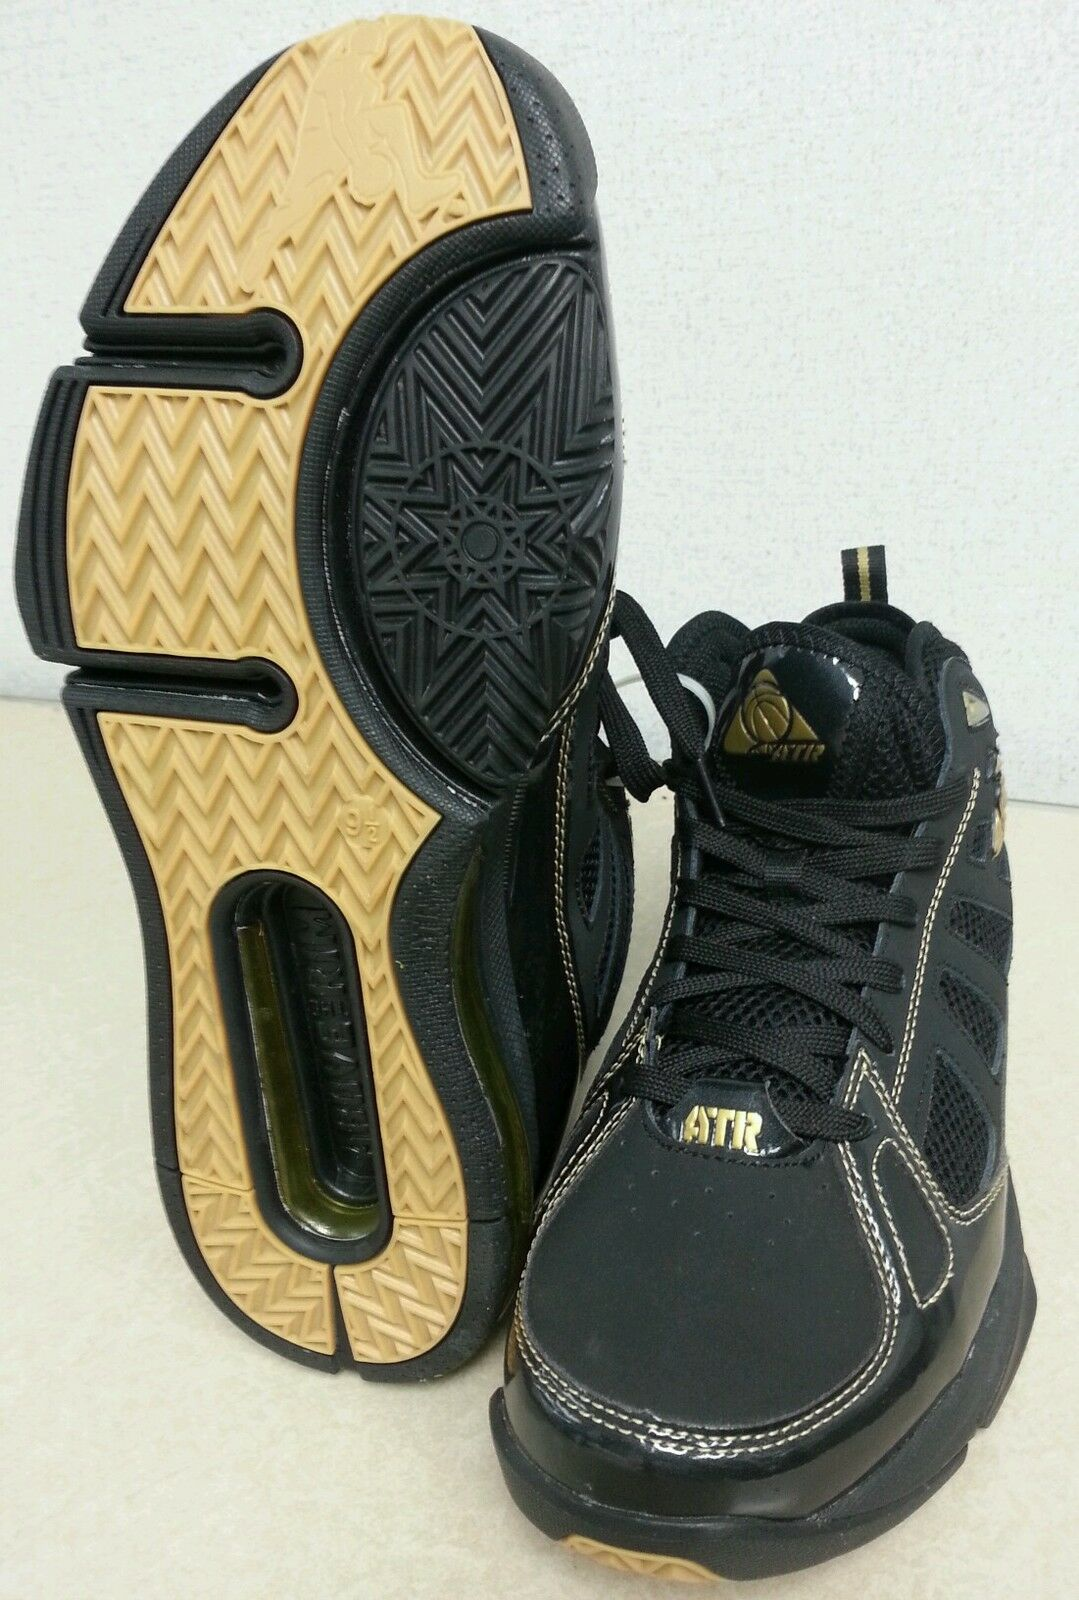 Vintage, rare !!!!!  above the rim shoes, black and gold ...tupac Jordan Kobe Seasonal price cuts, discount benefits